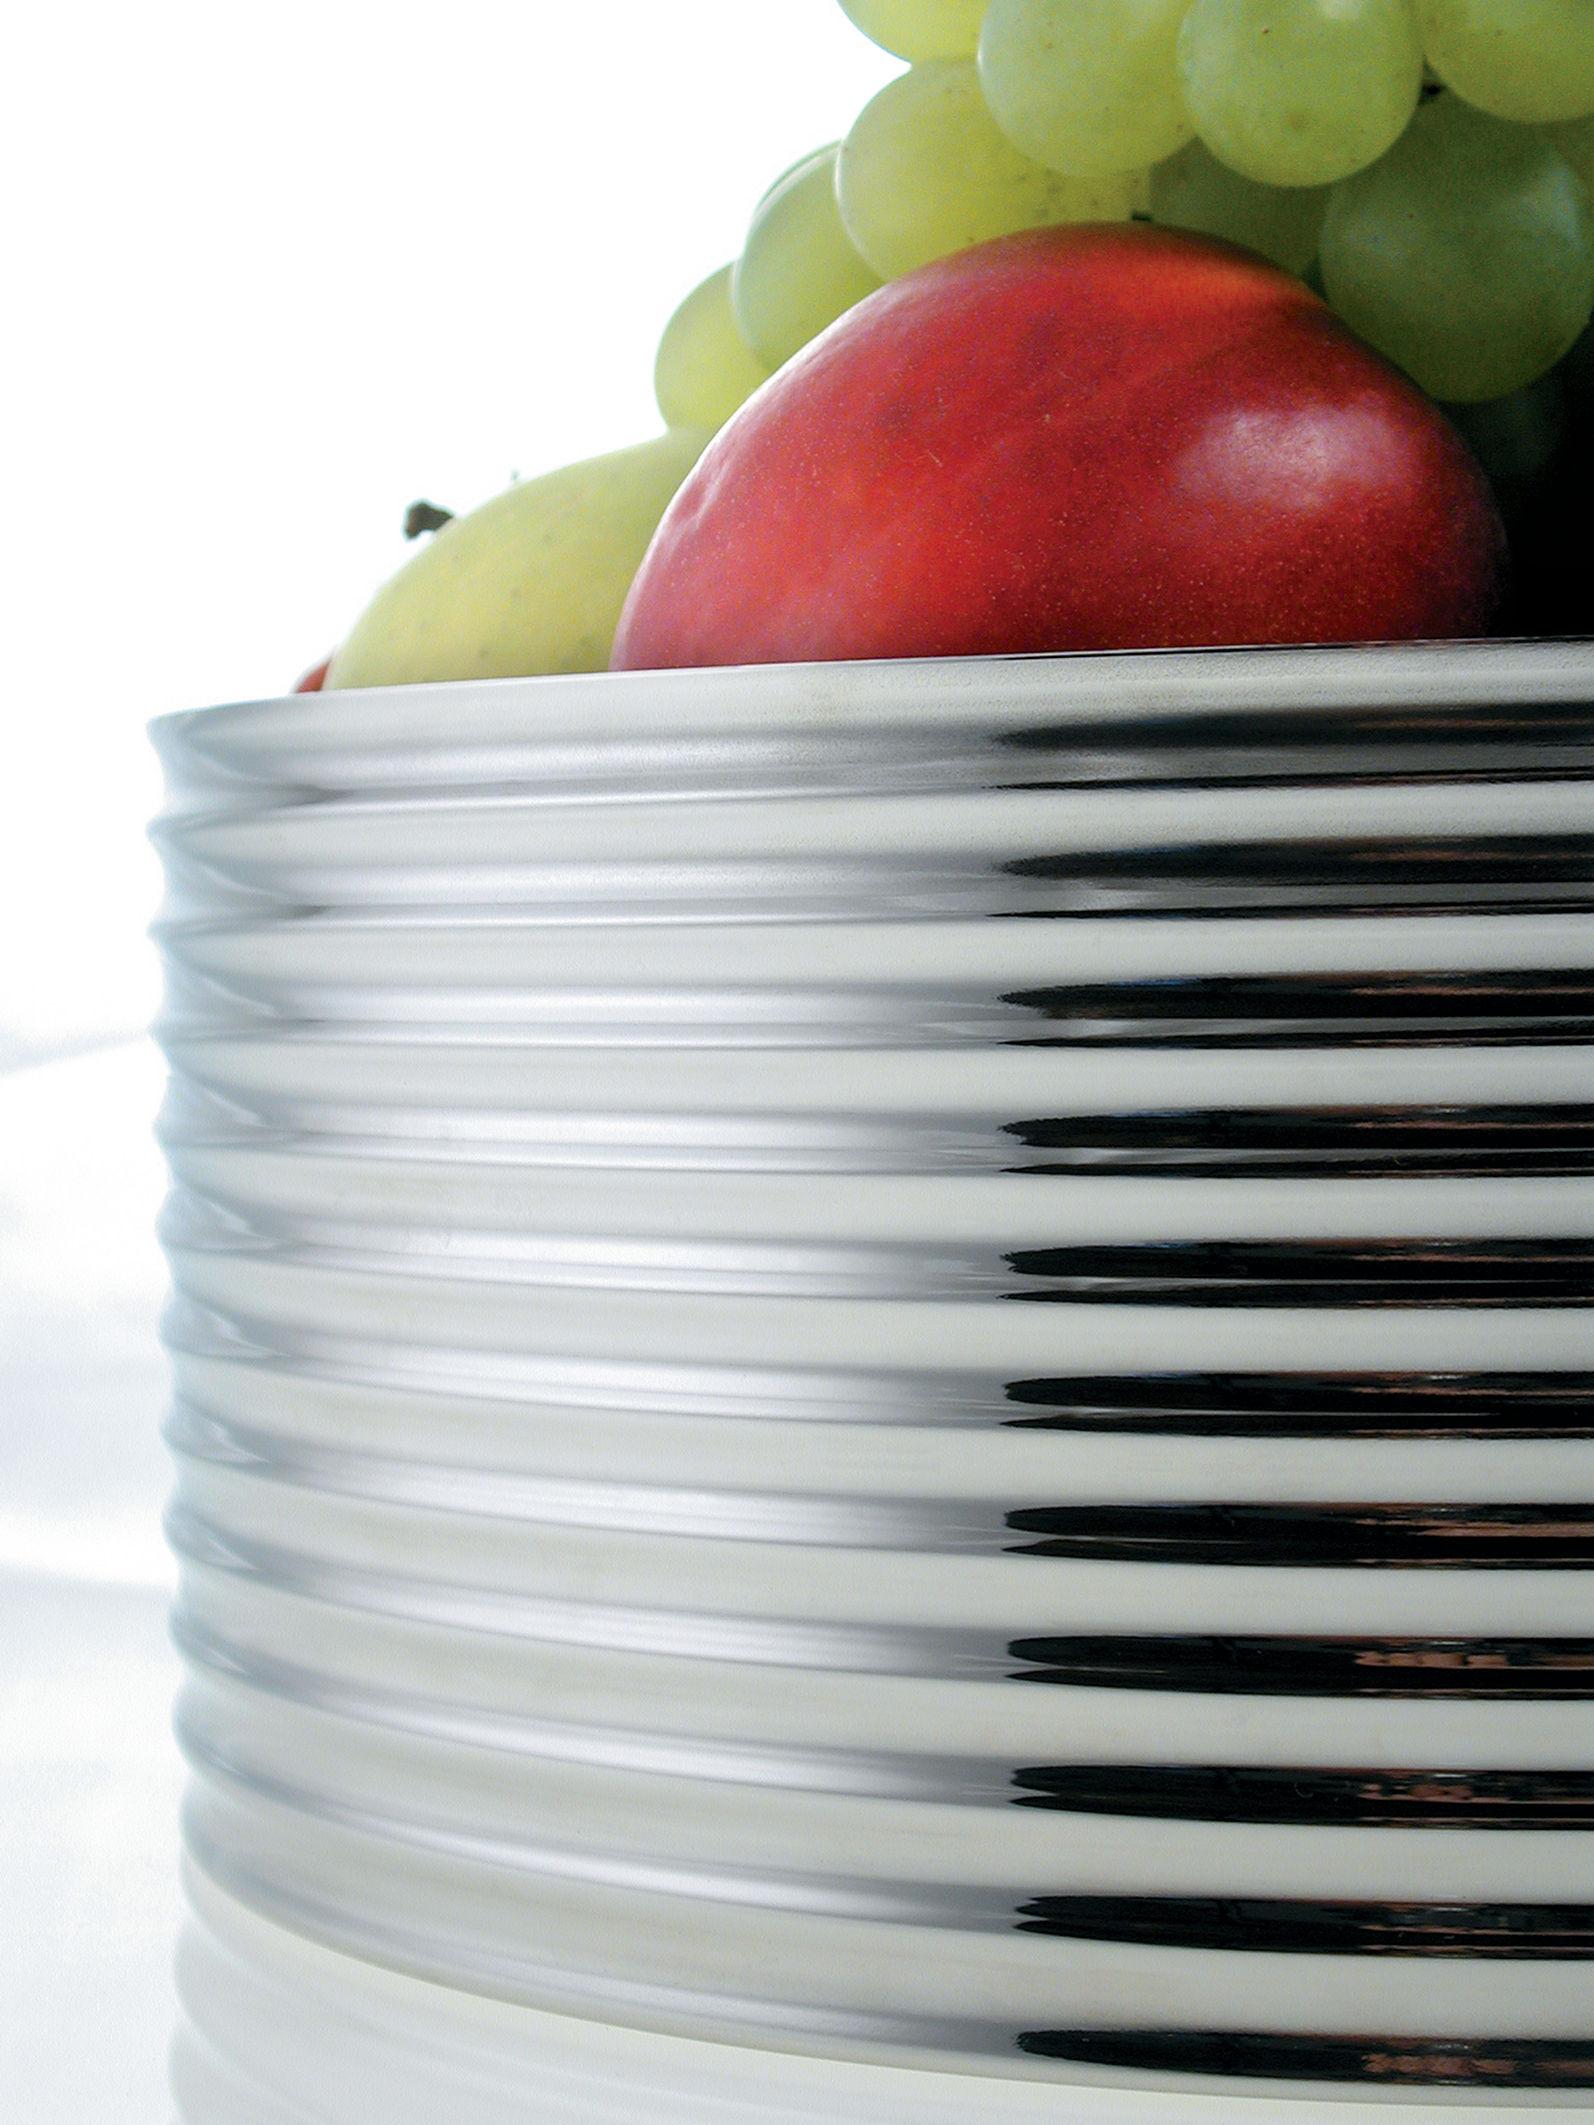 Vague fruit bowl steel by alessi - Alessi fruit bowl ...